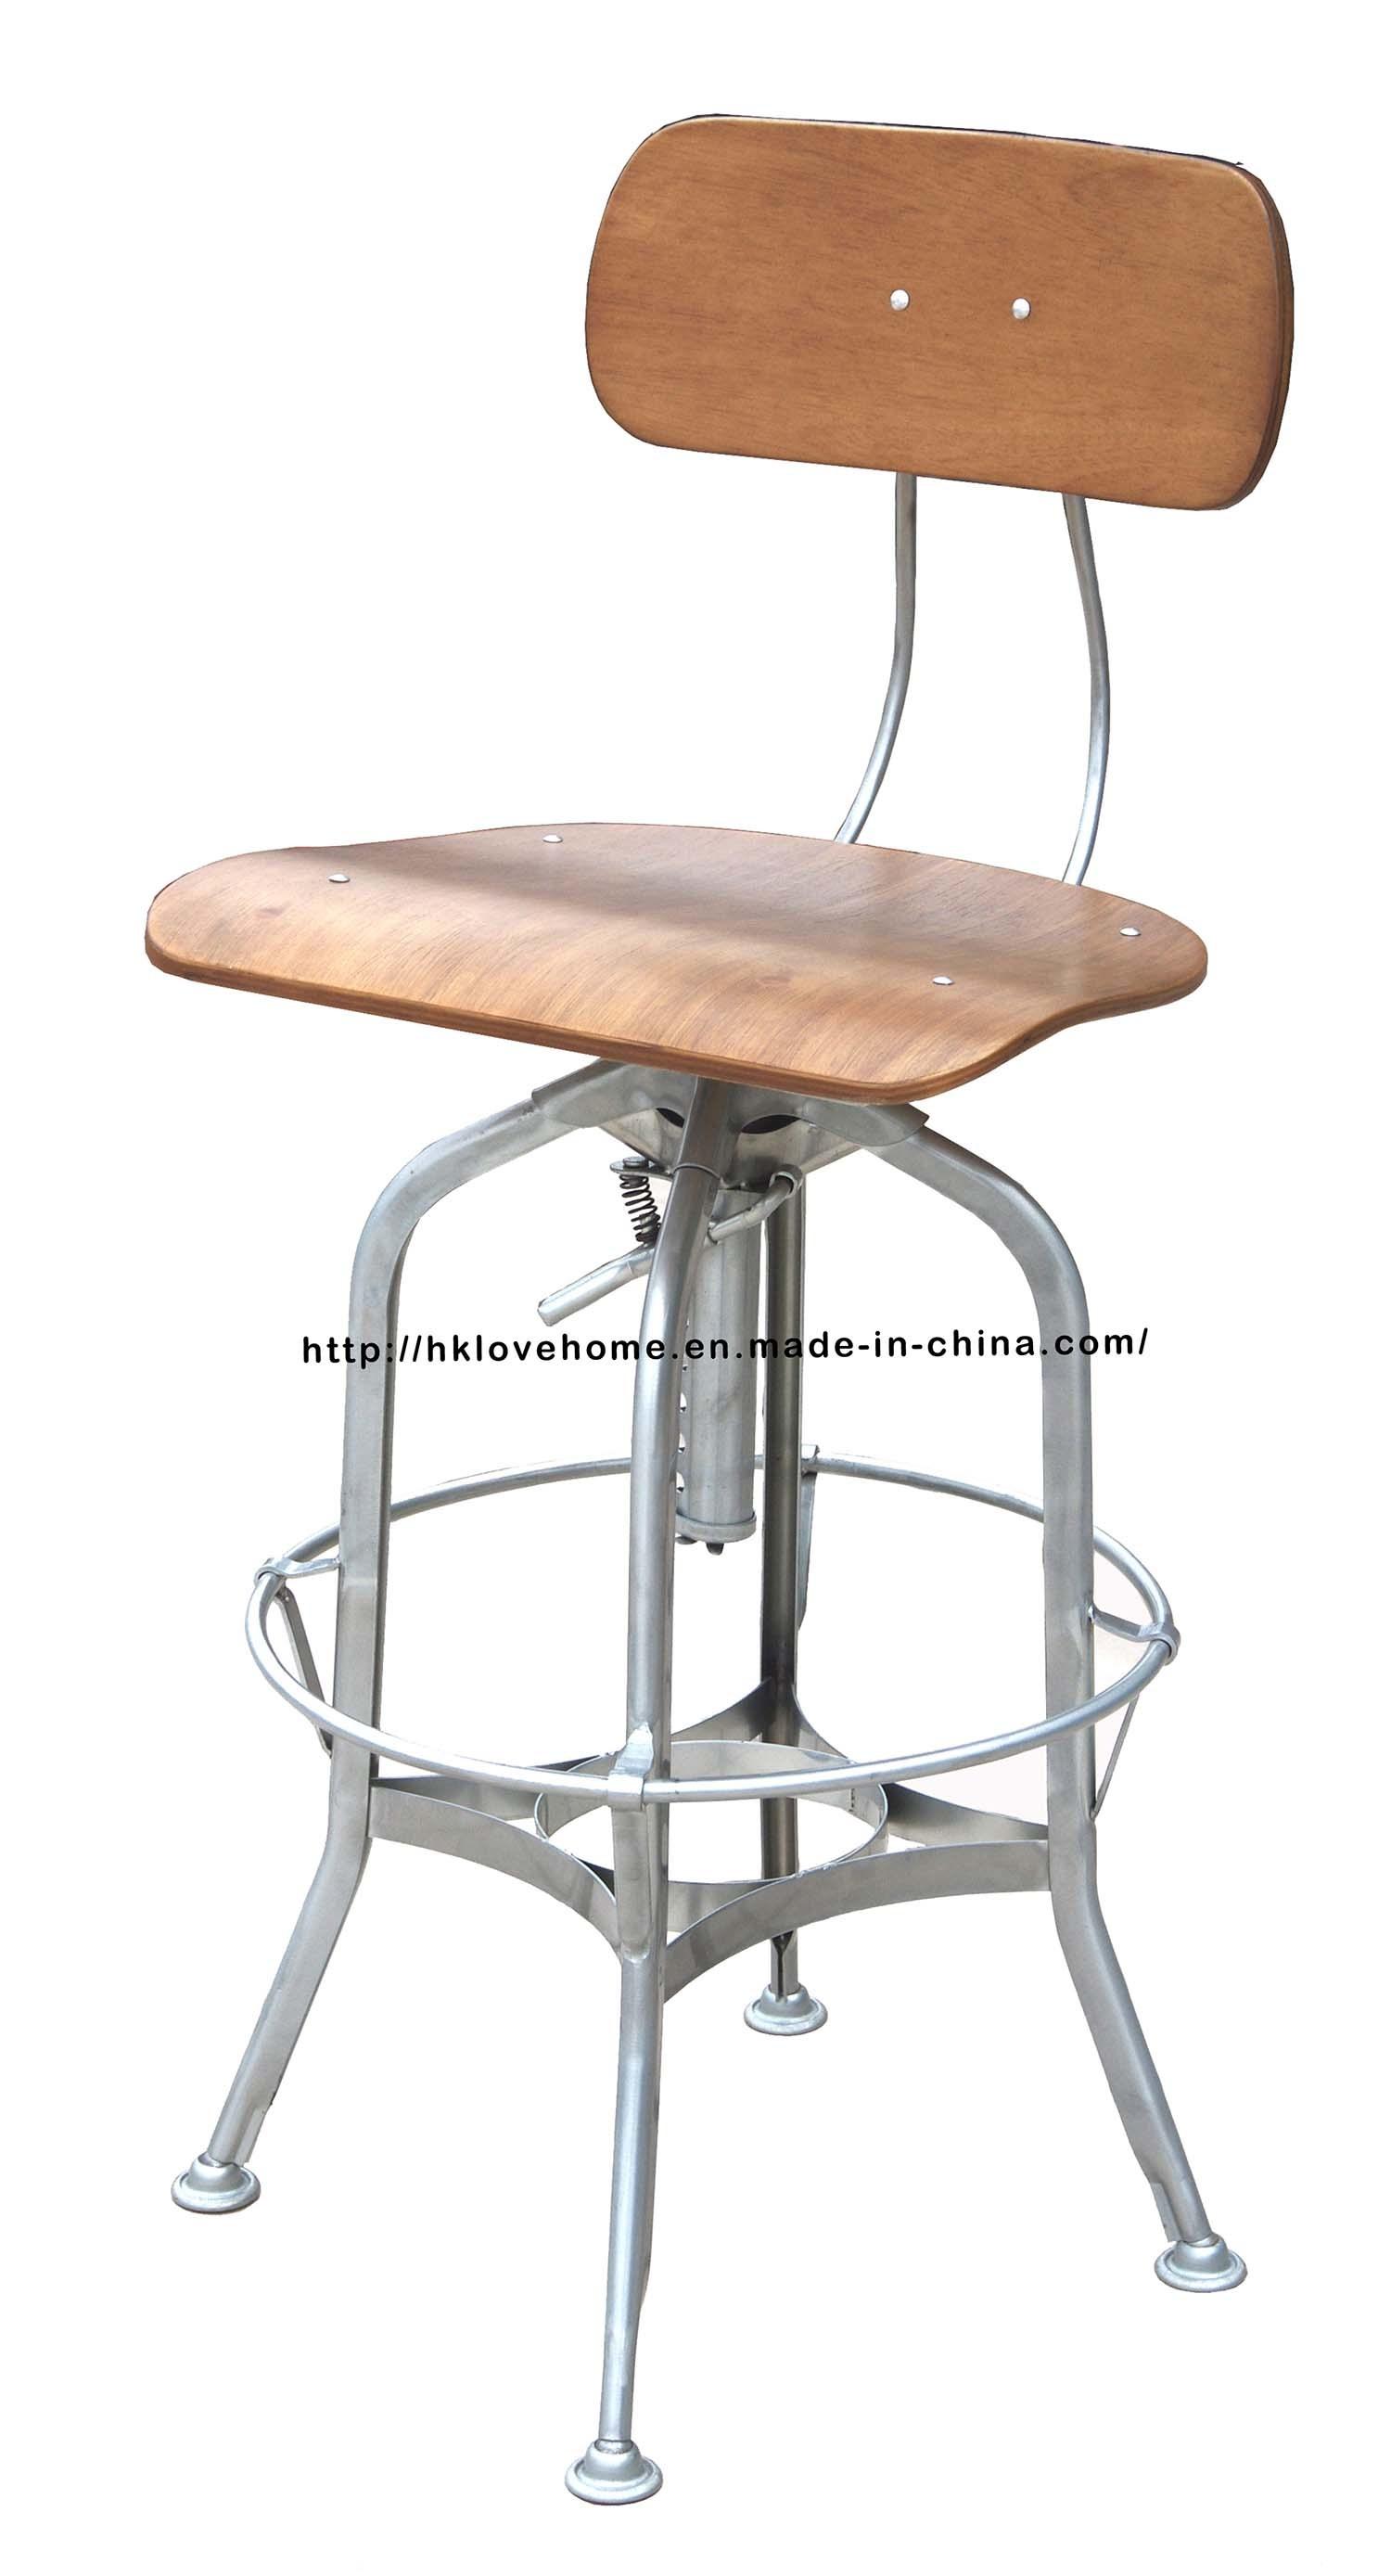 Pleasant Hot Item Replica Industrial Restaurant Furniture Dining Toledo Bar Stools Chairs Short Links Chair Design For Home Short Linksinfo